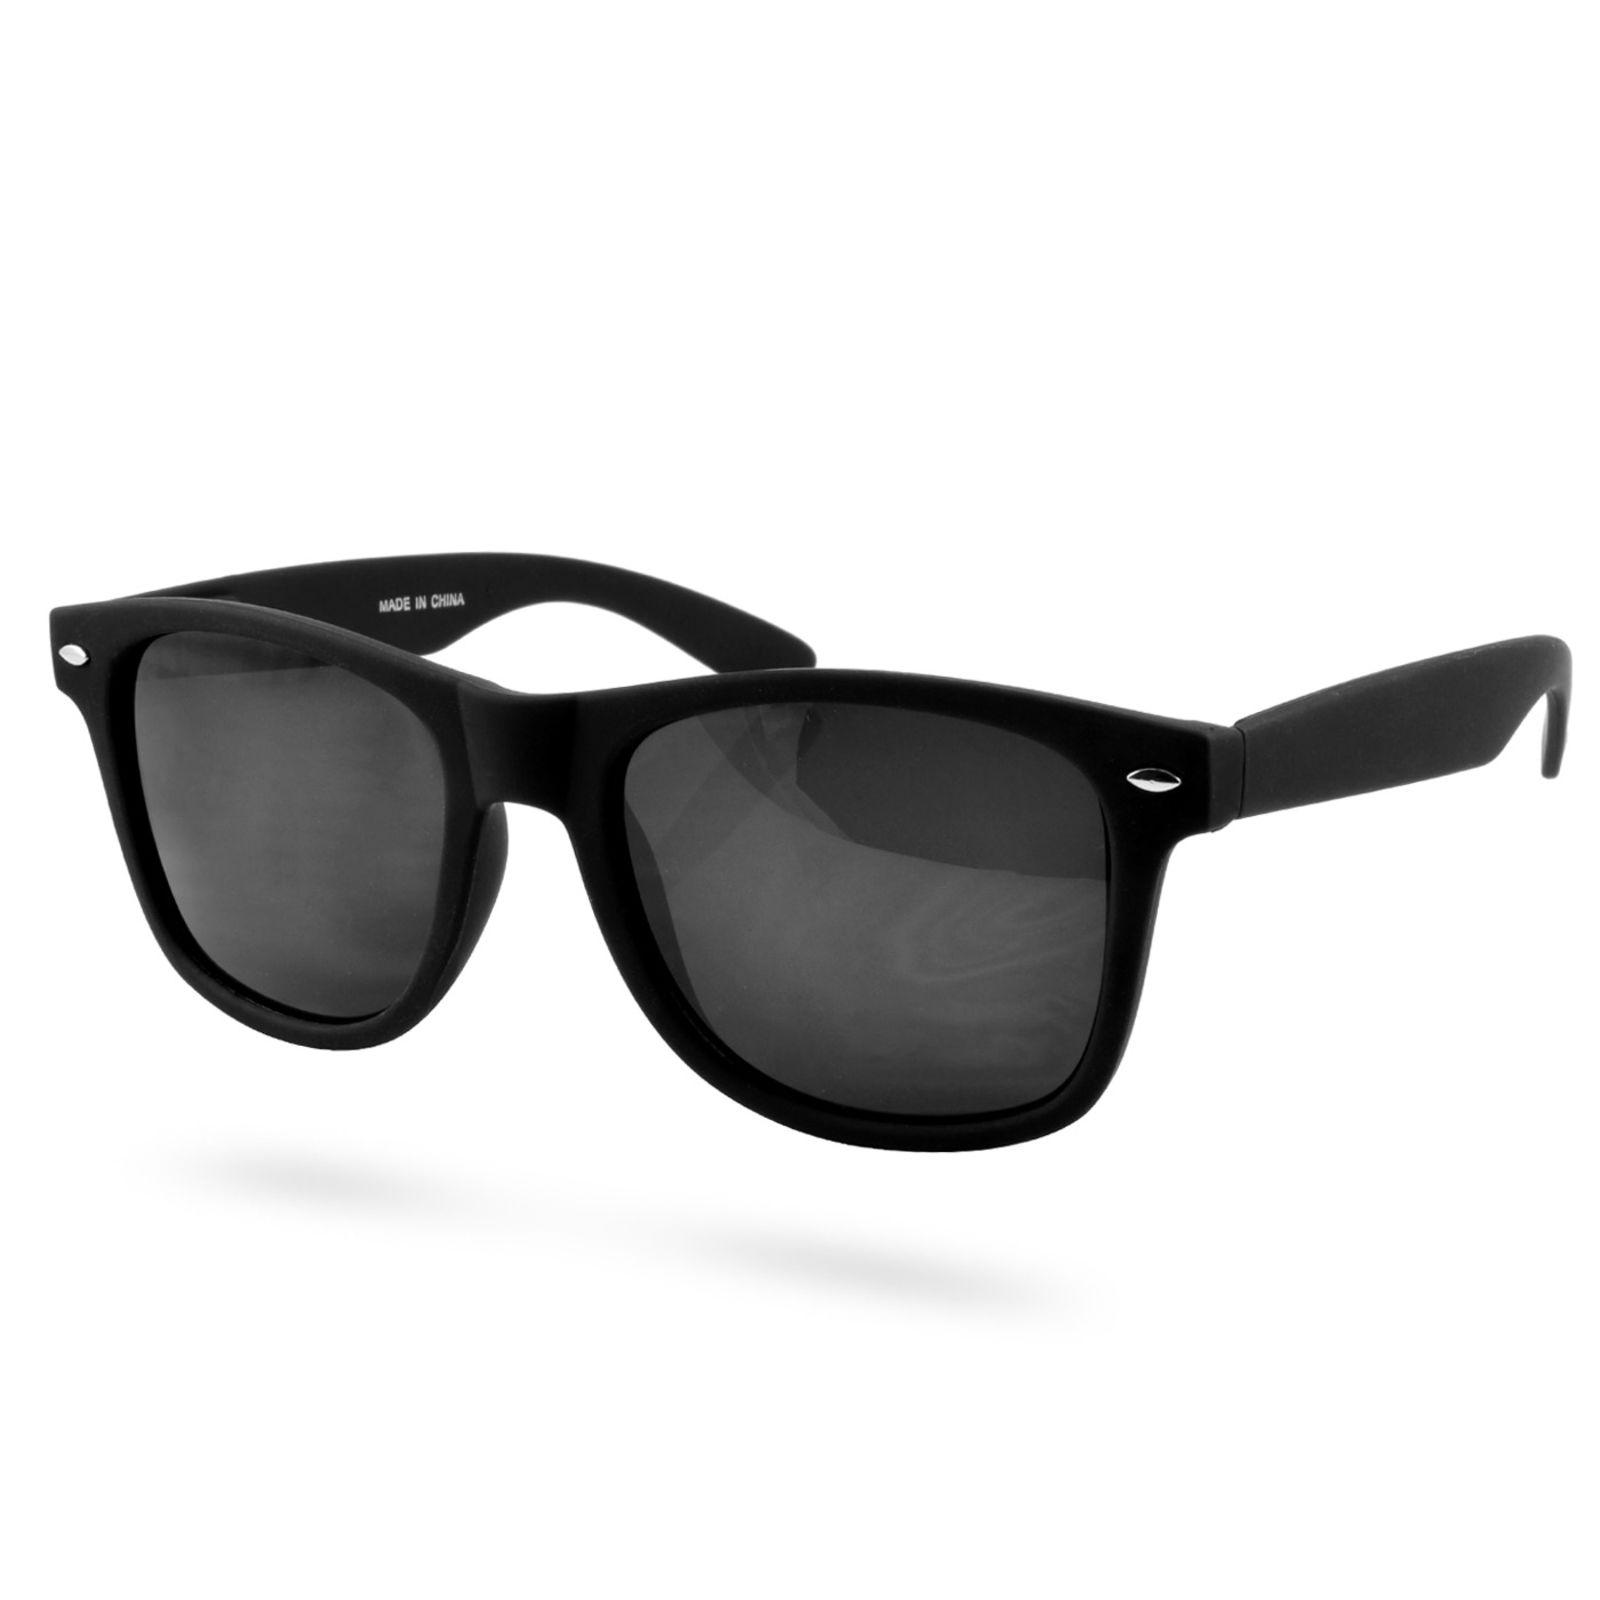 EverShade Matné čierne retro slnečné okuliare - Glami.sk a20887a3e75